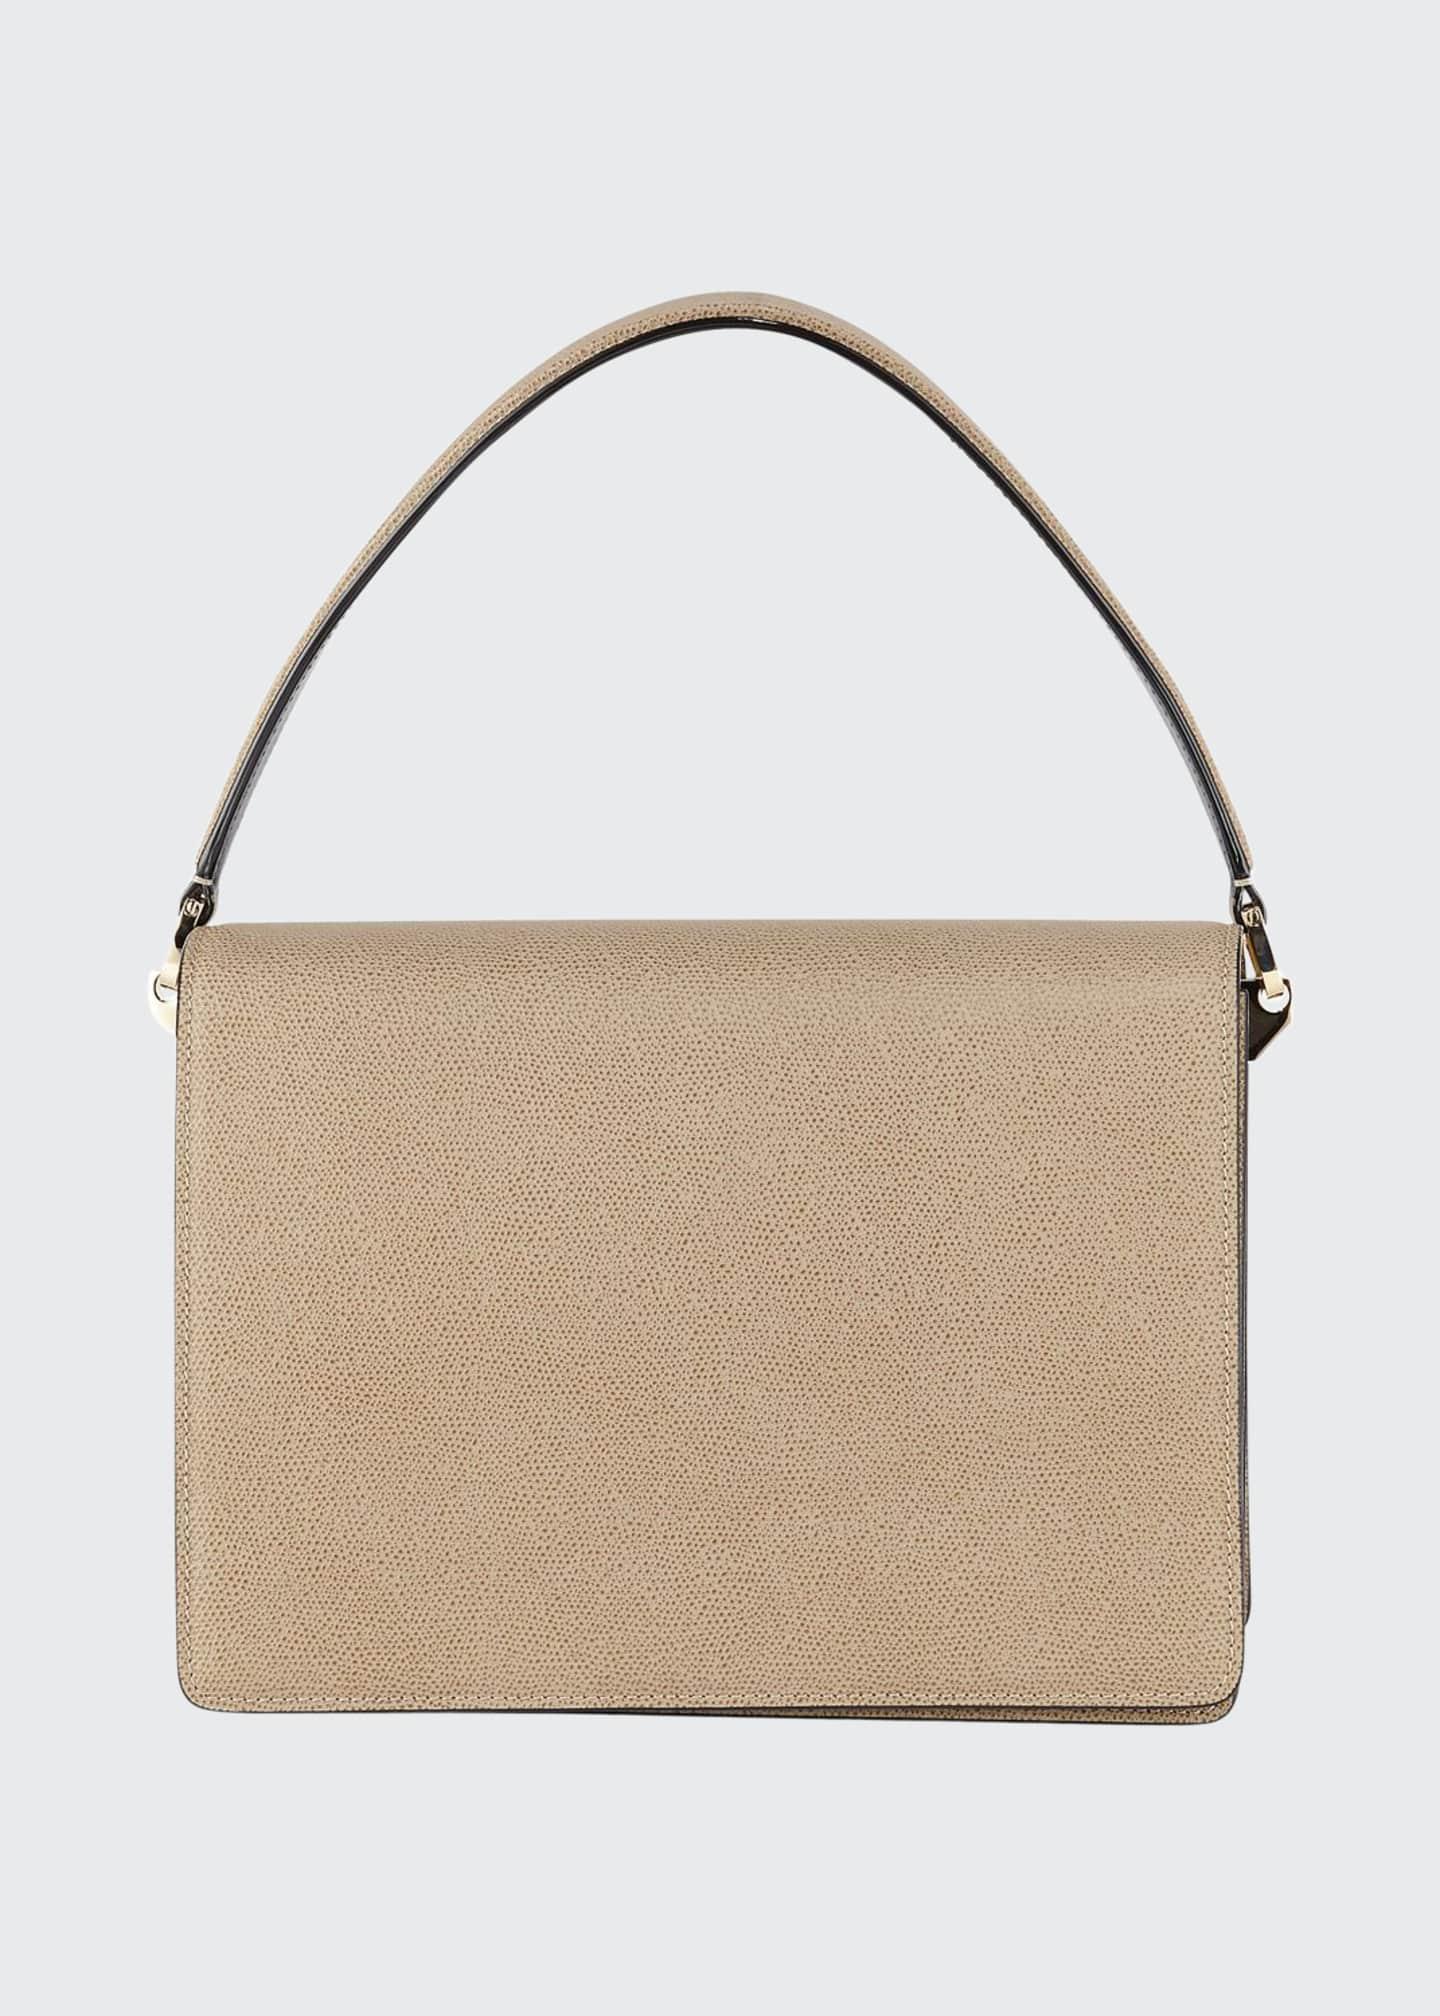 Valextra Twist Grained Leather Shoulder Bag